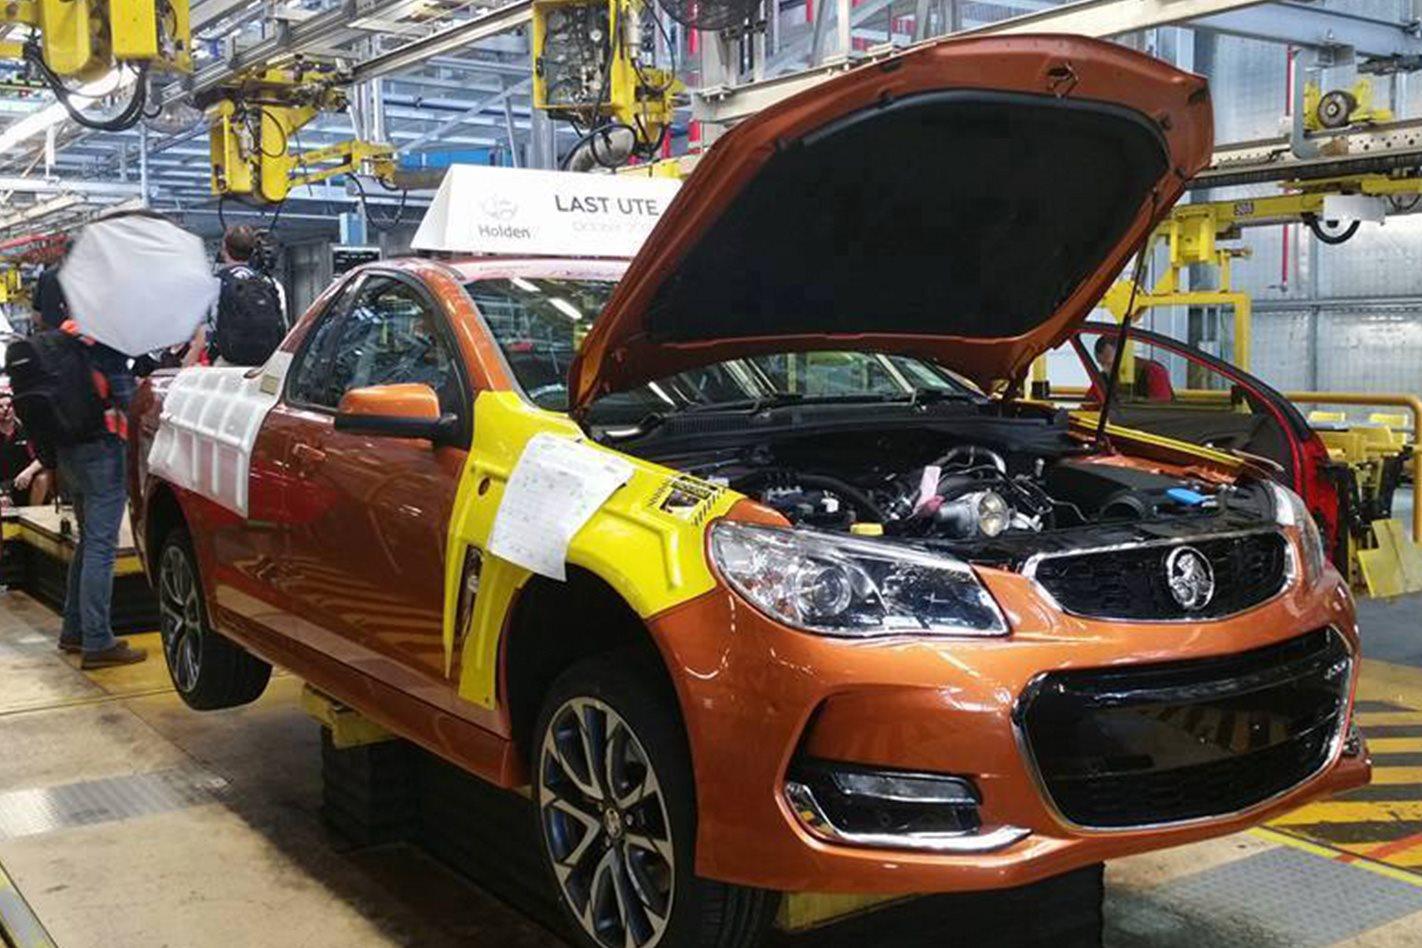 2017-Holden-Commodore-SS-Ute.jpg